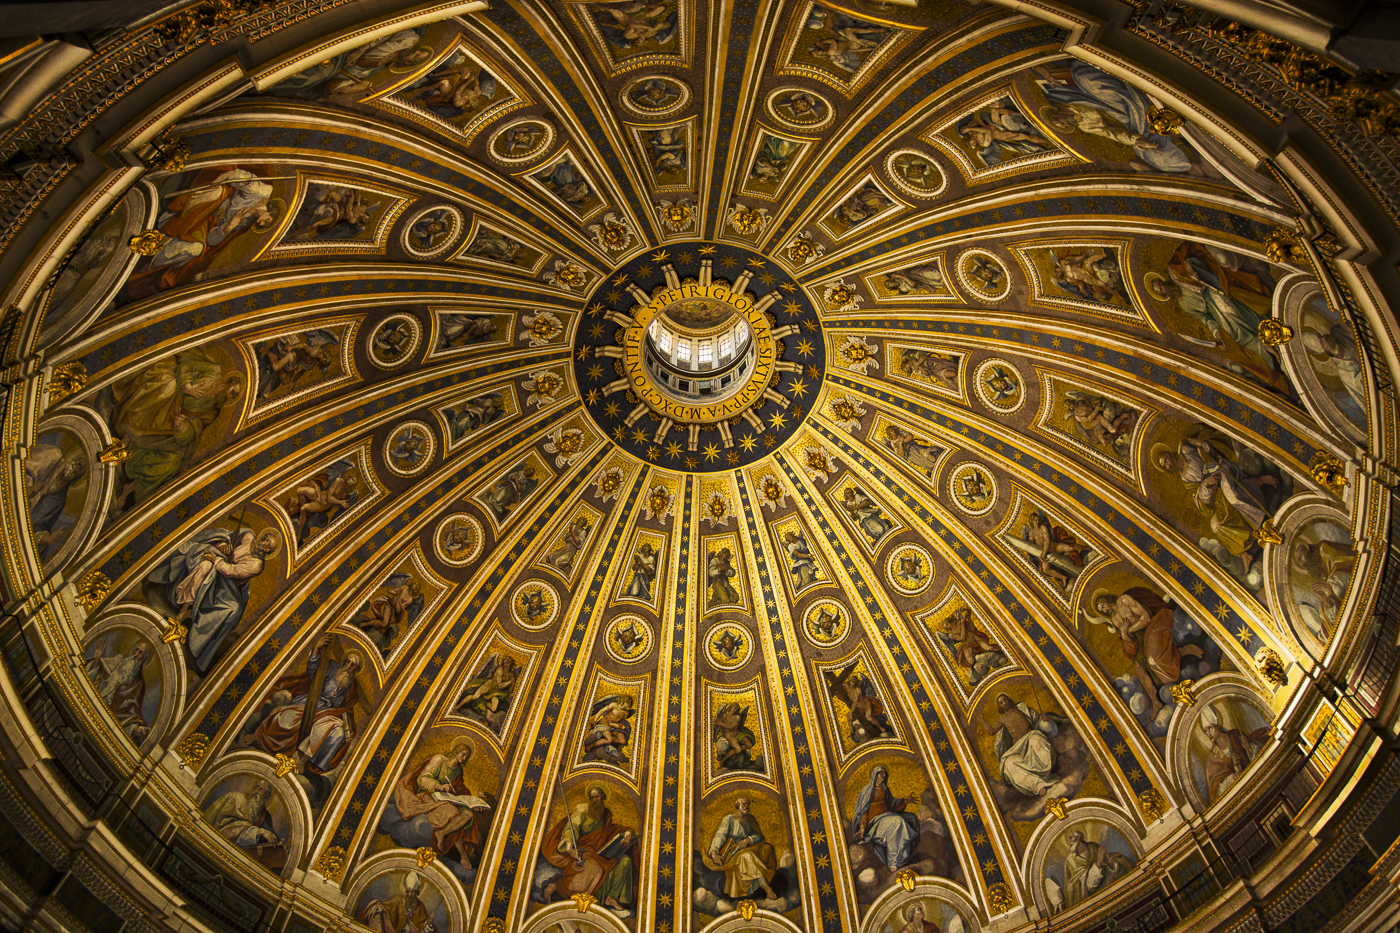 St. Peter's Basilica Coppola